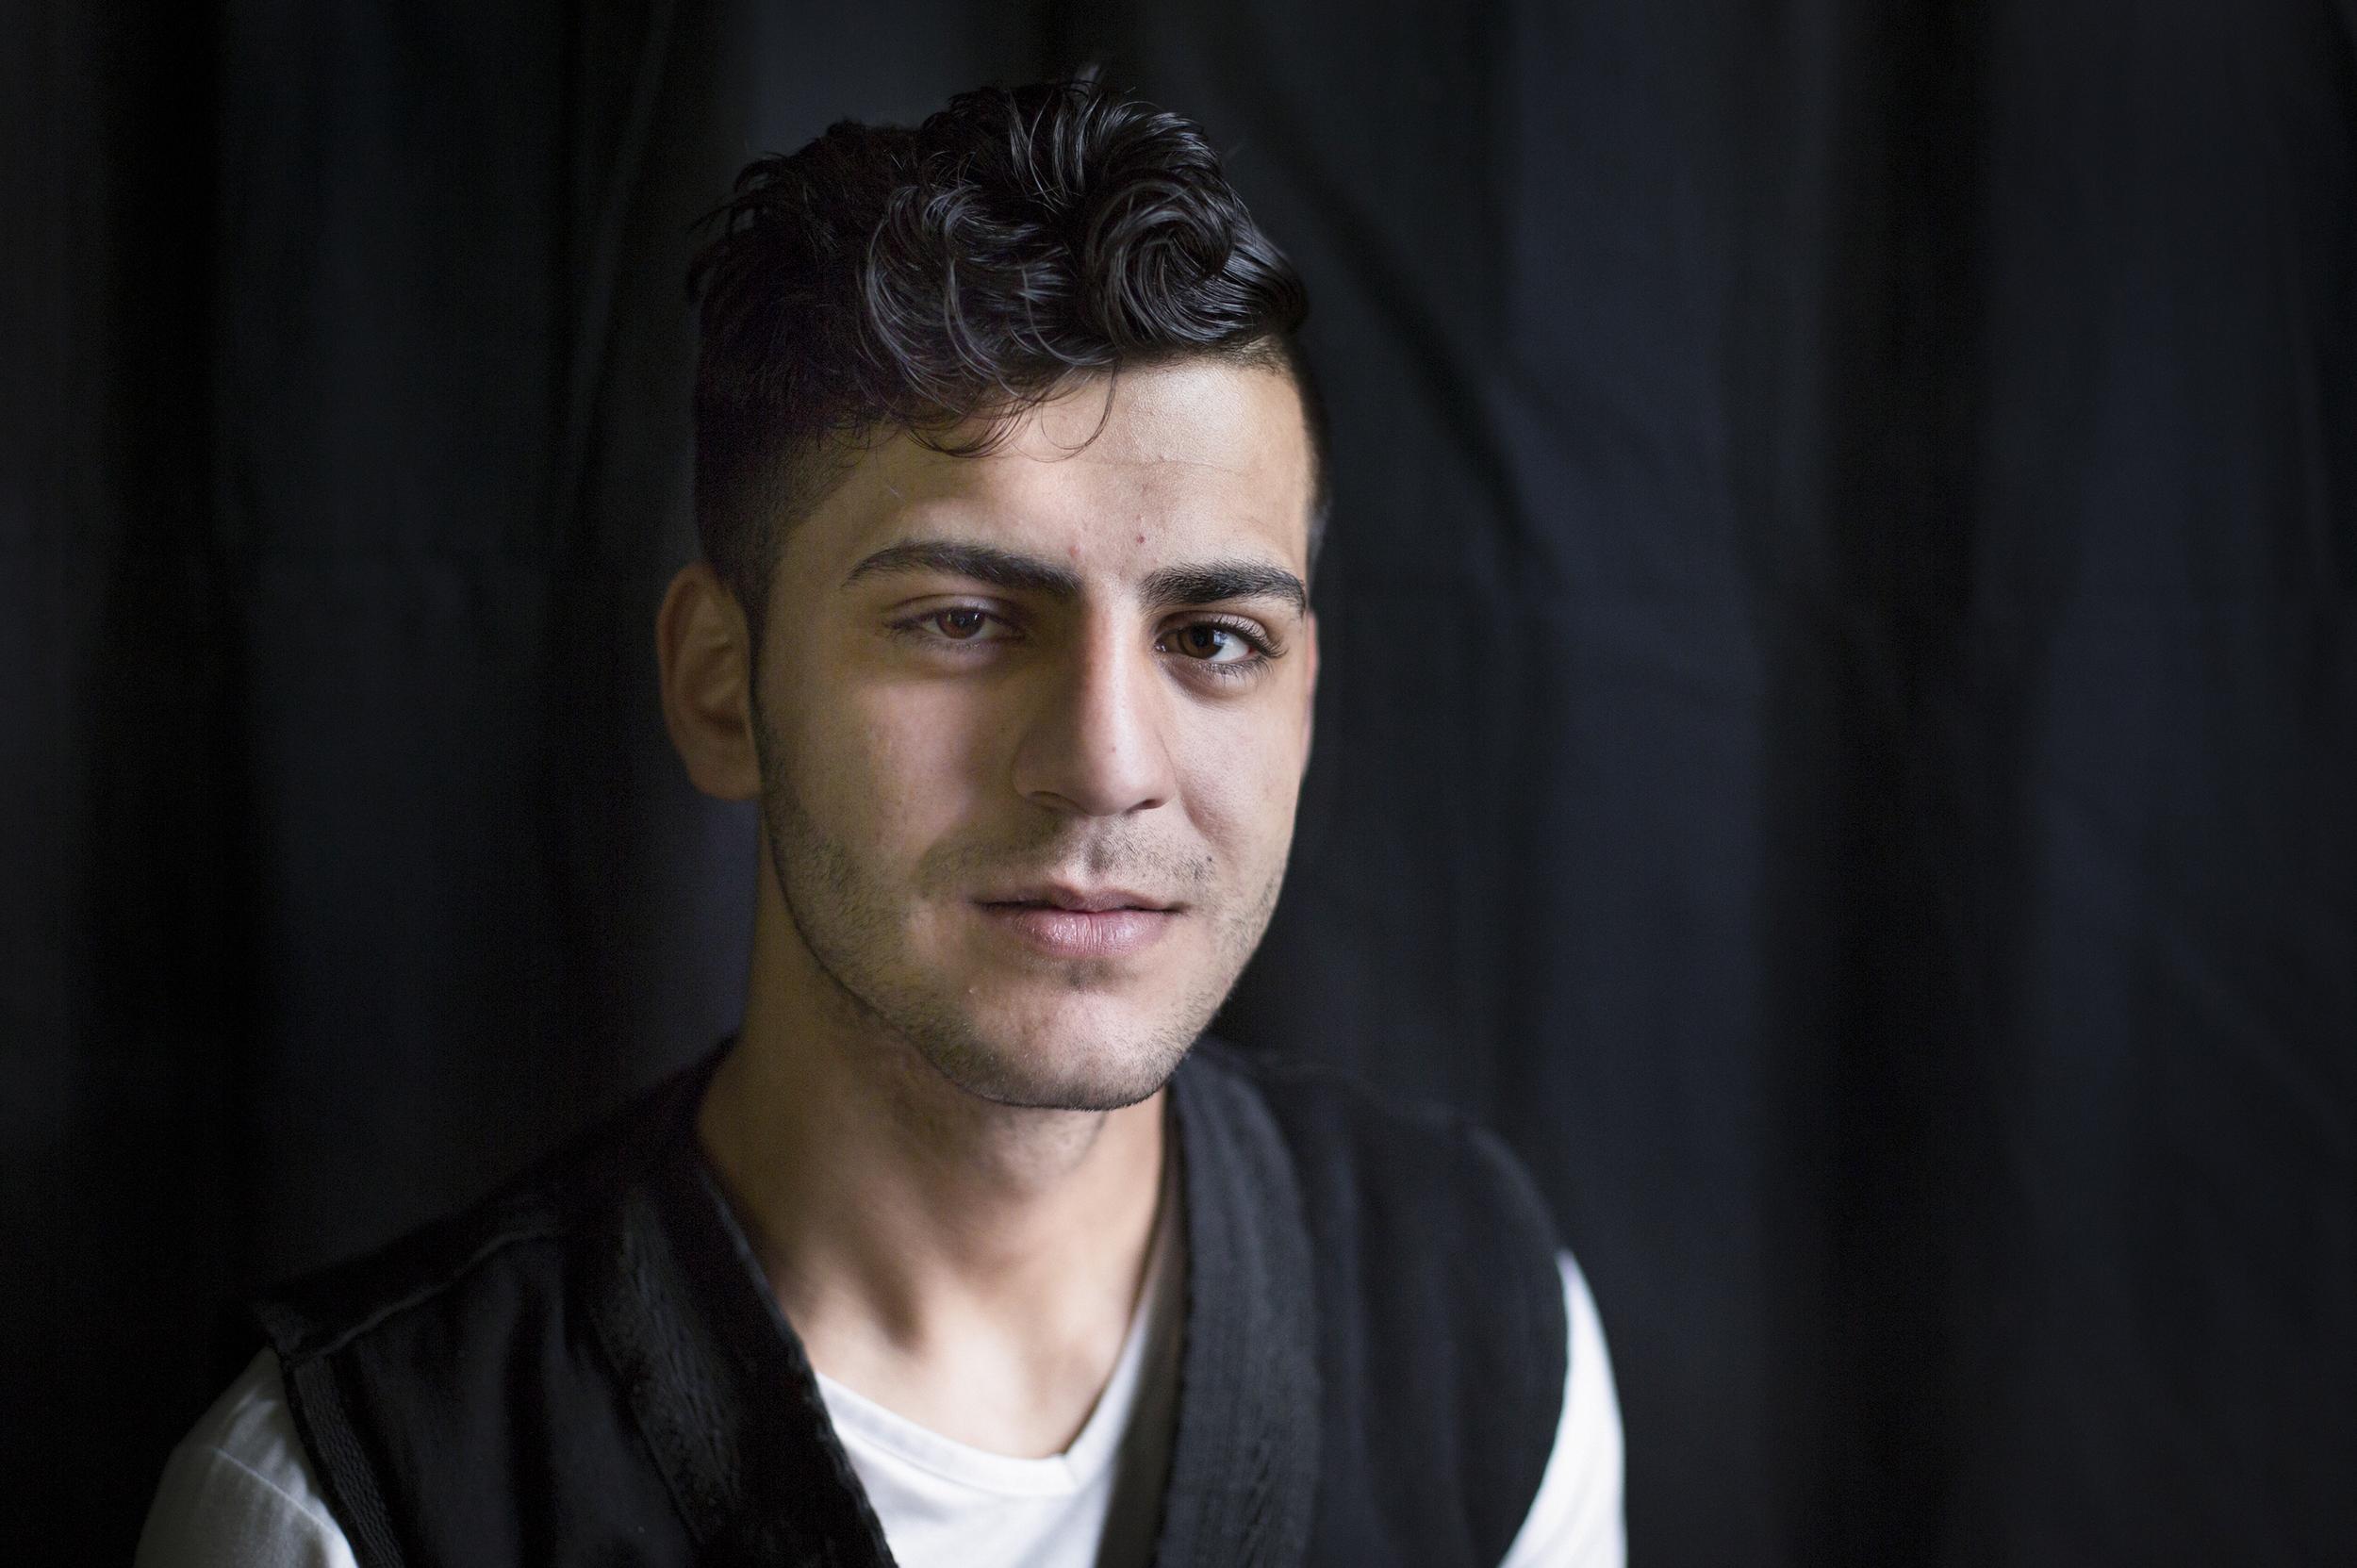 Mohammed Al Khaleel